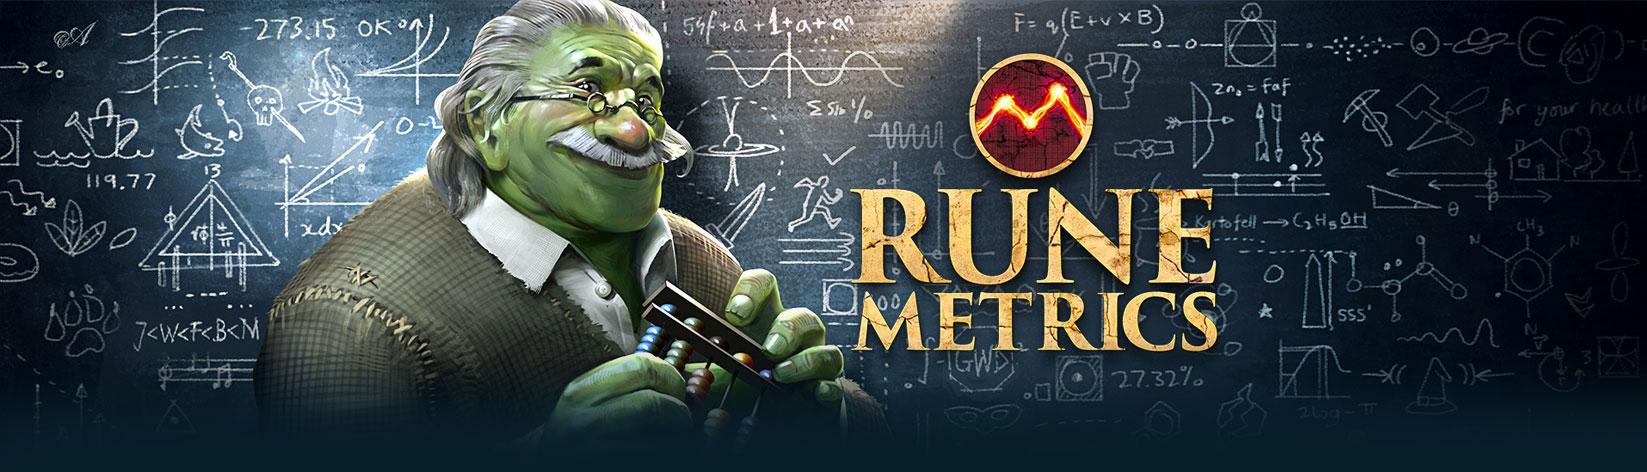 Welcome - RuneMetrics - RuneScape player stat tracking